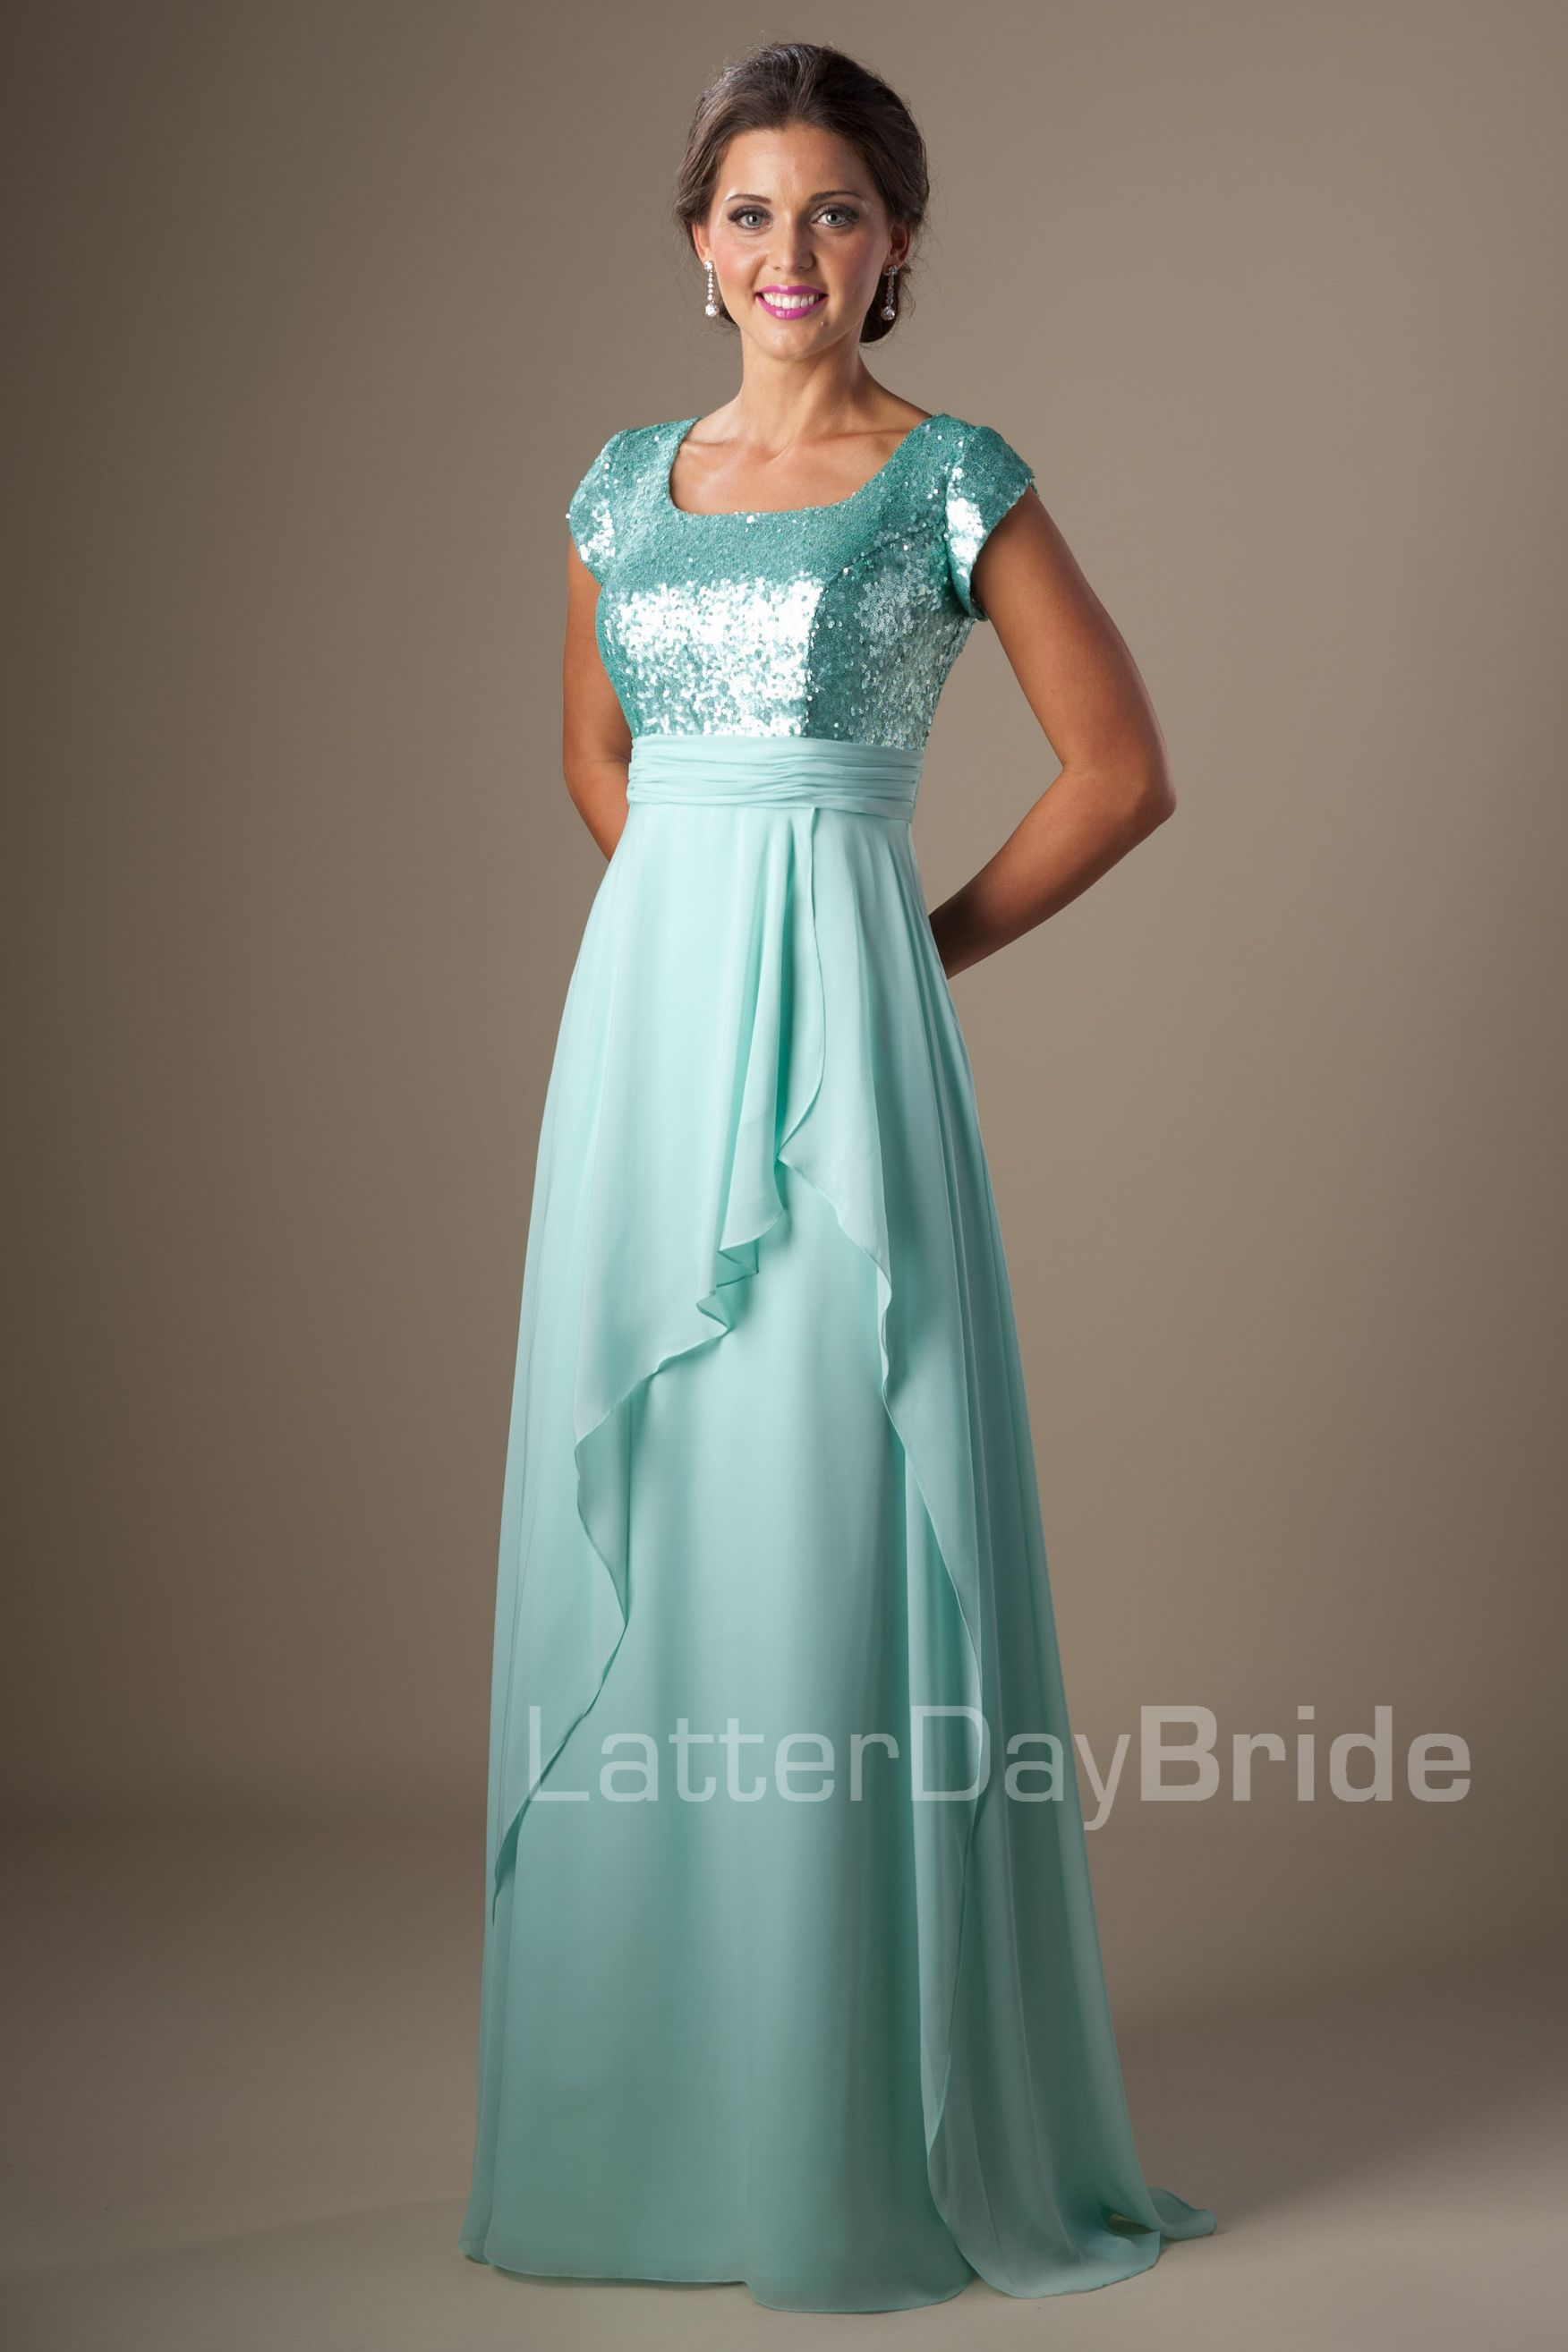 Modest Prom Dresses : Amelia | Modest Prom Dresses | Pinterest ...